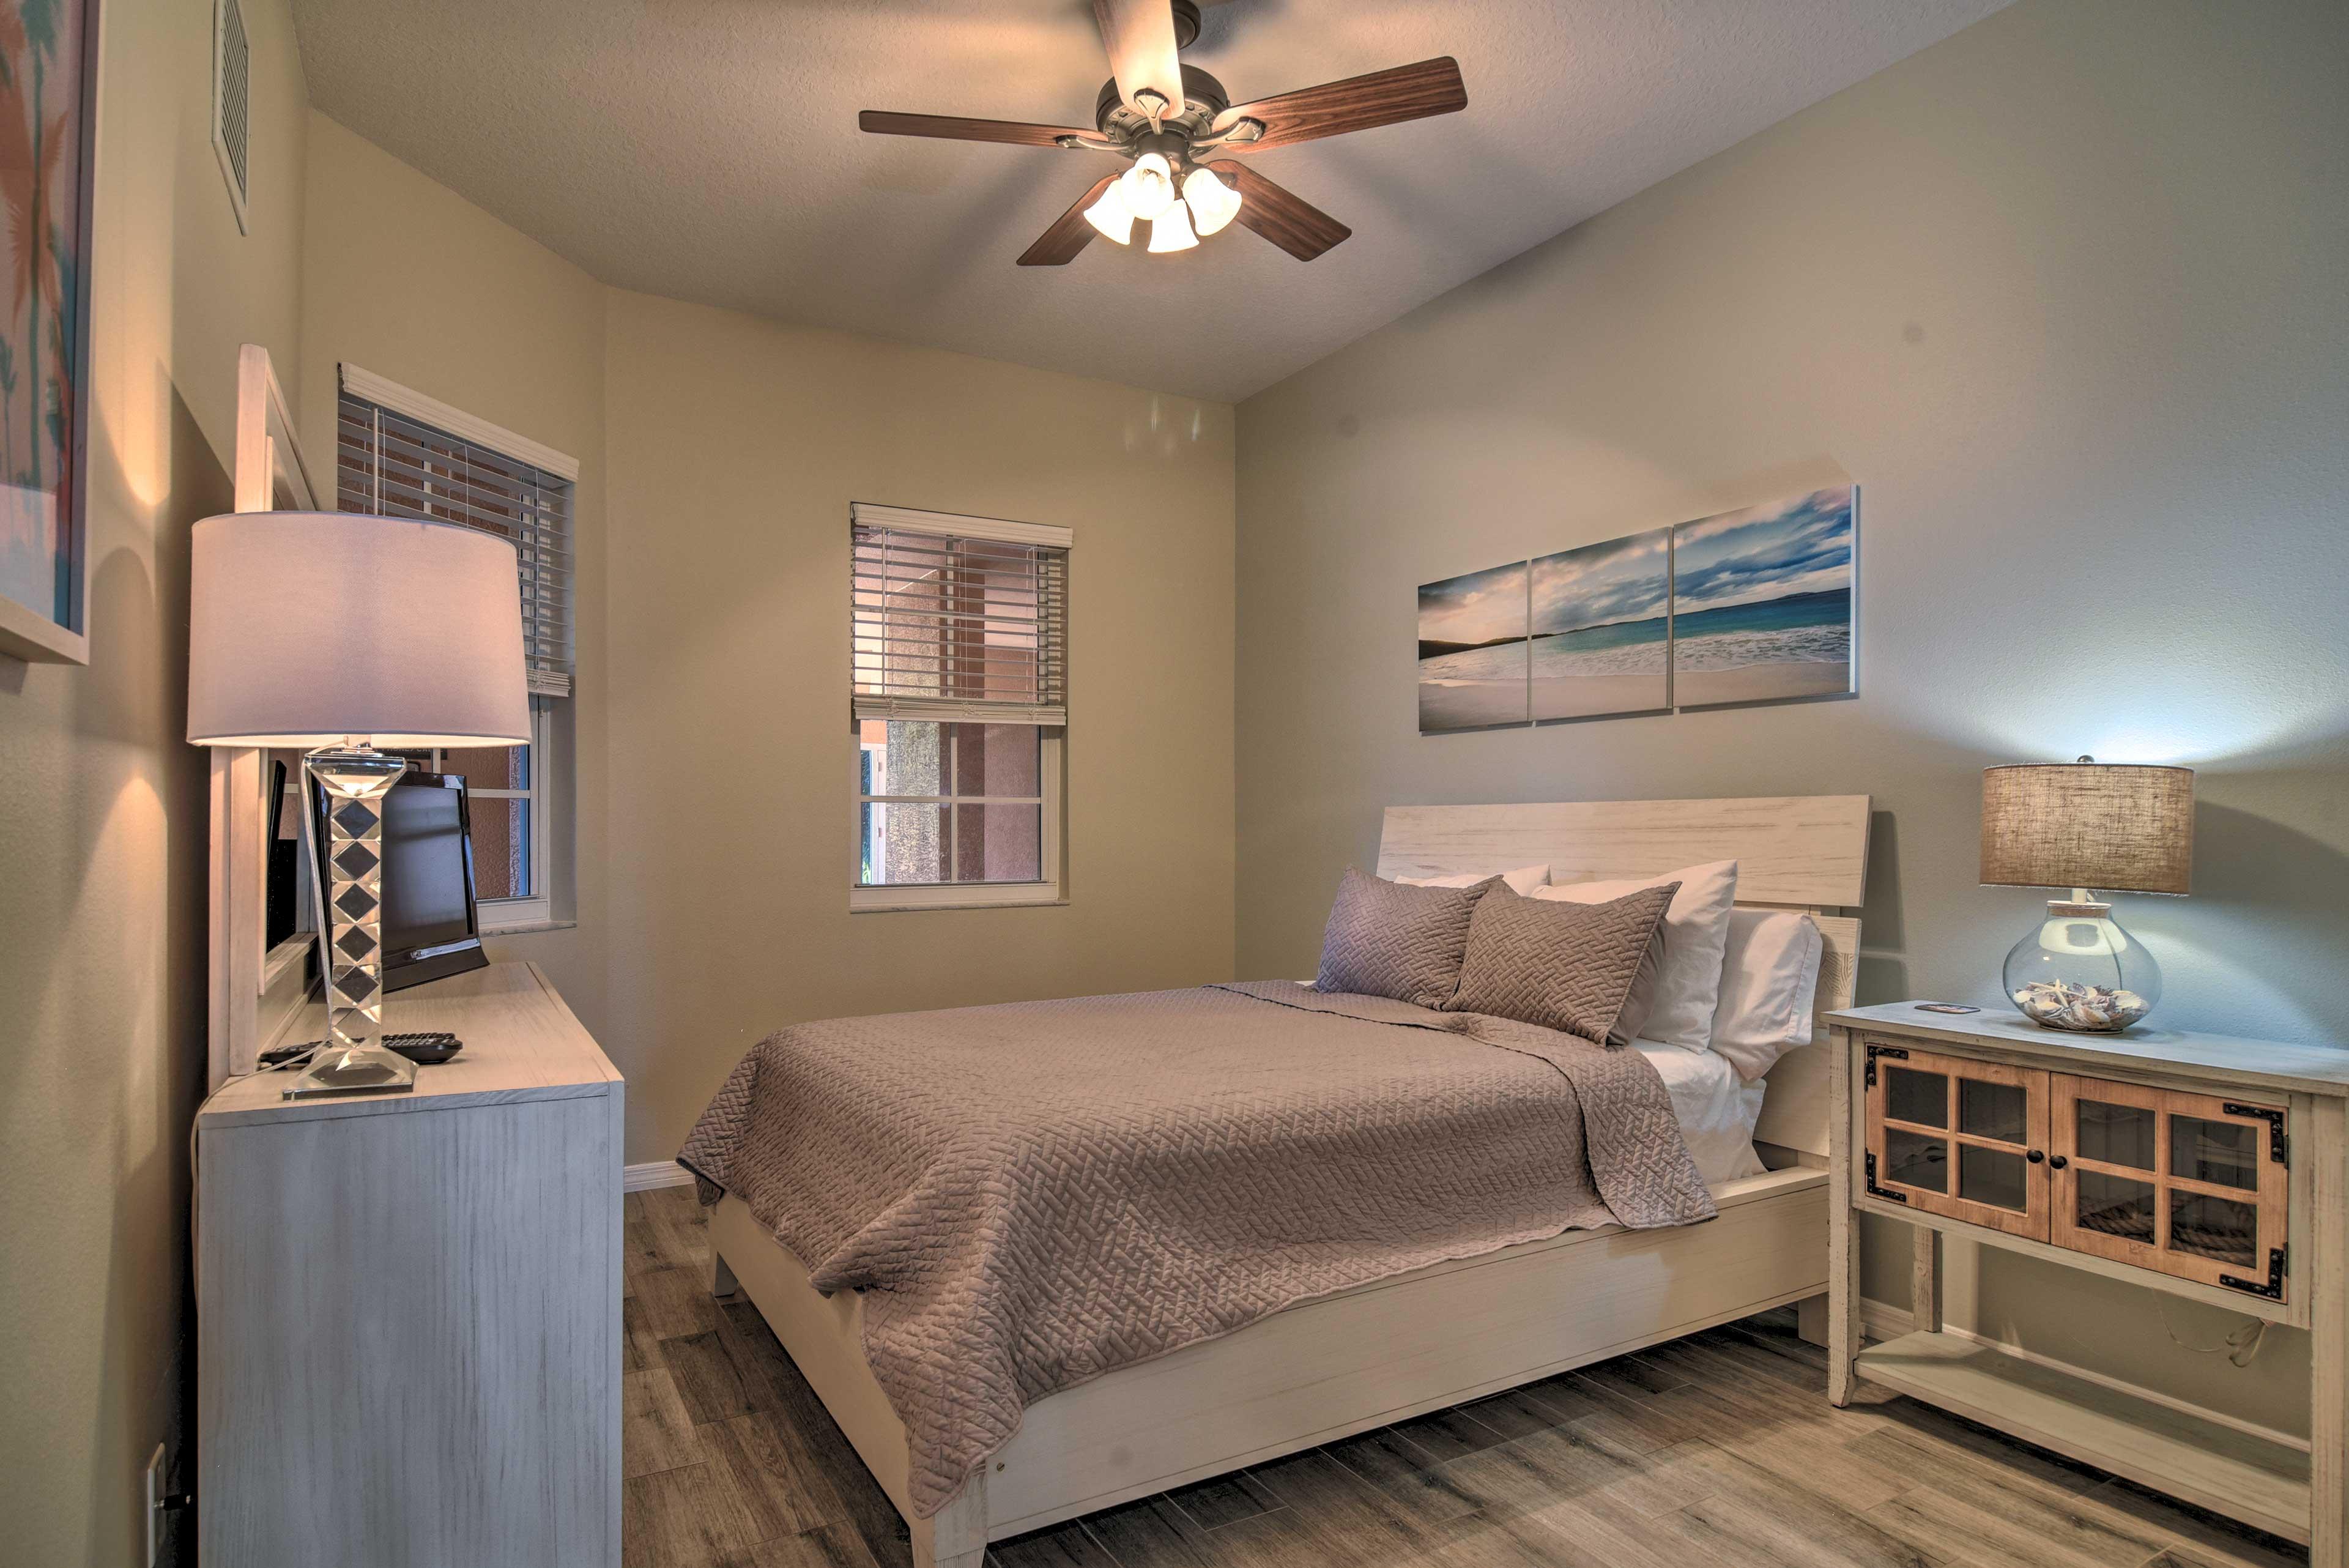 Bedroom | Queen Bed | Linens Provided